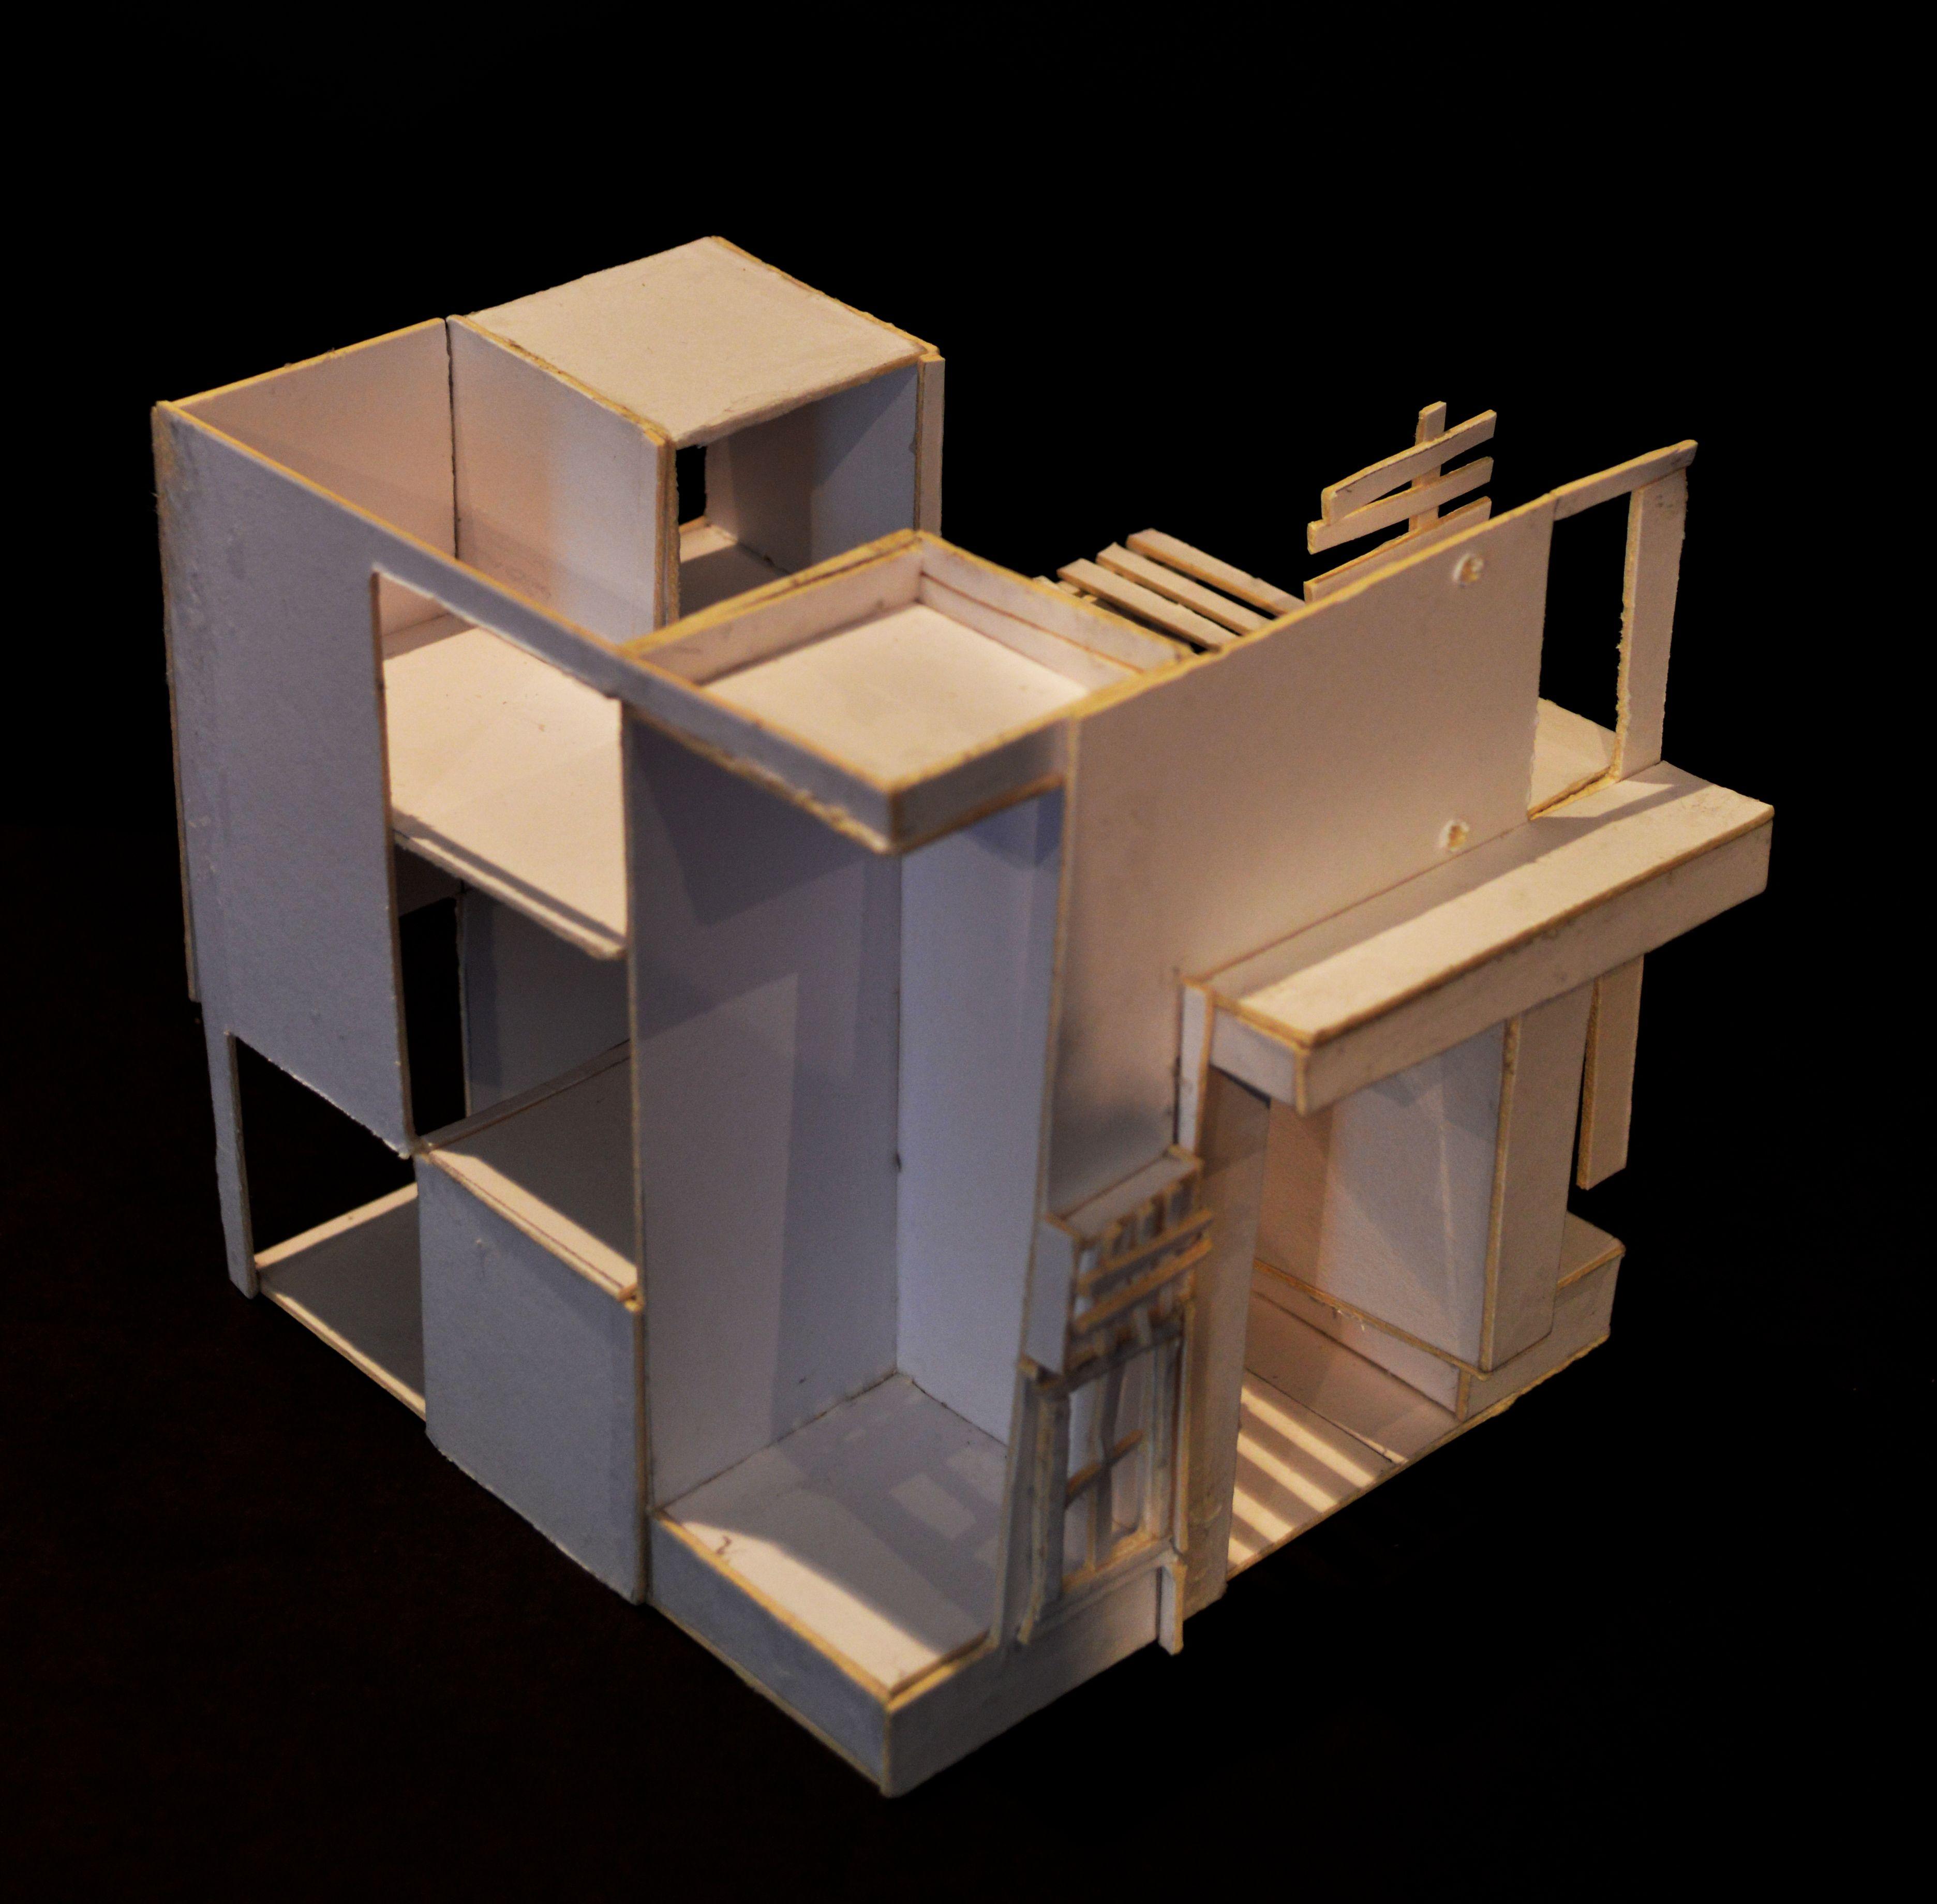 final model updated architecture design space cube model grid arch 1342 design. Black Bedroom Furniture Sets. Home Design Ideas